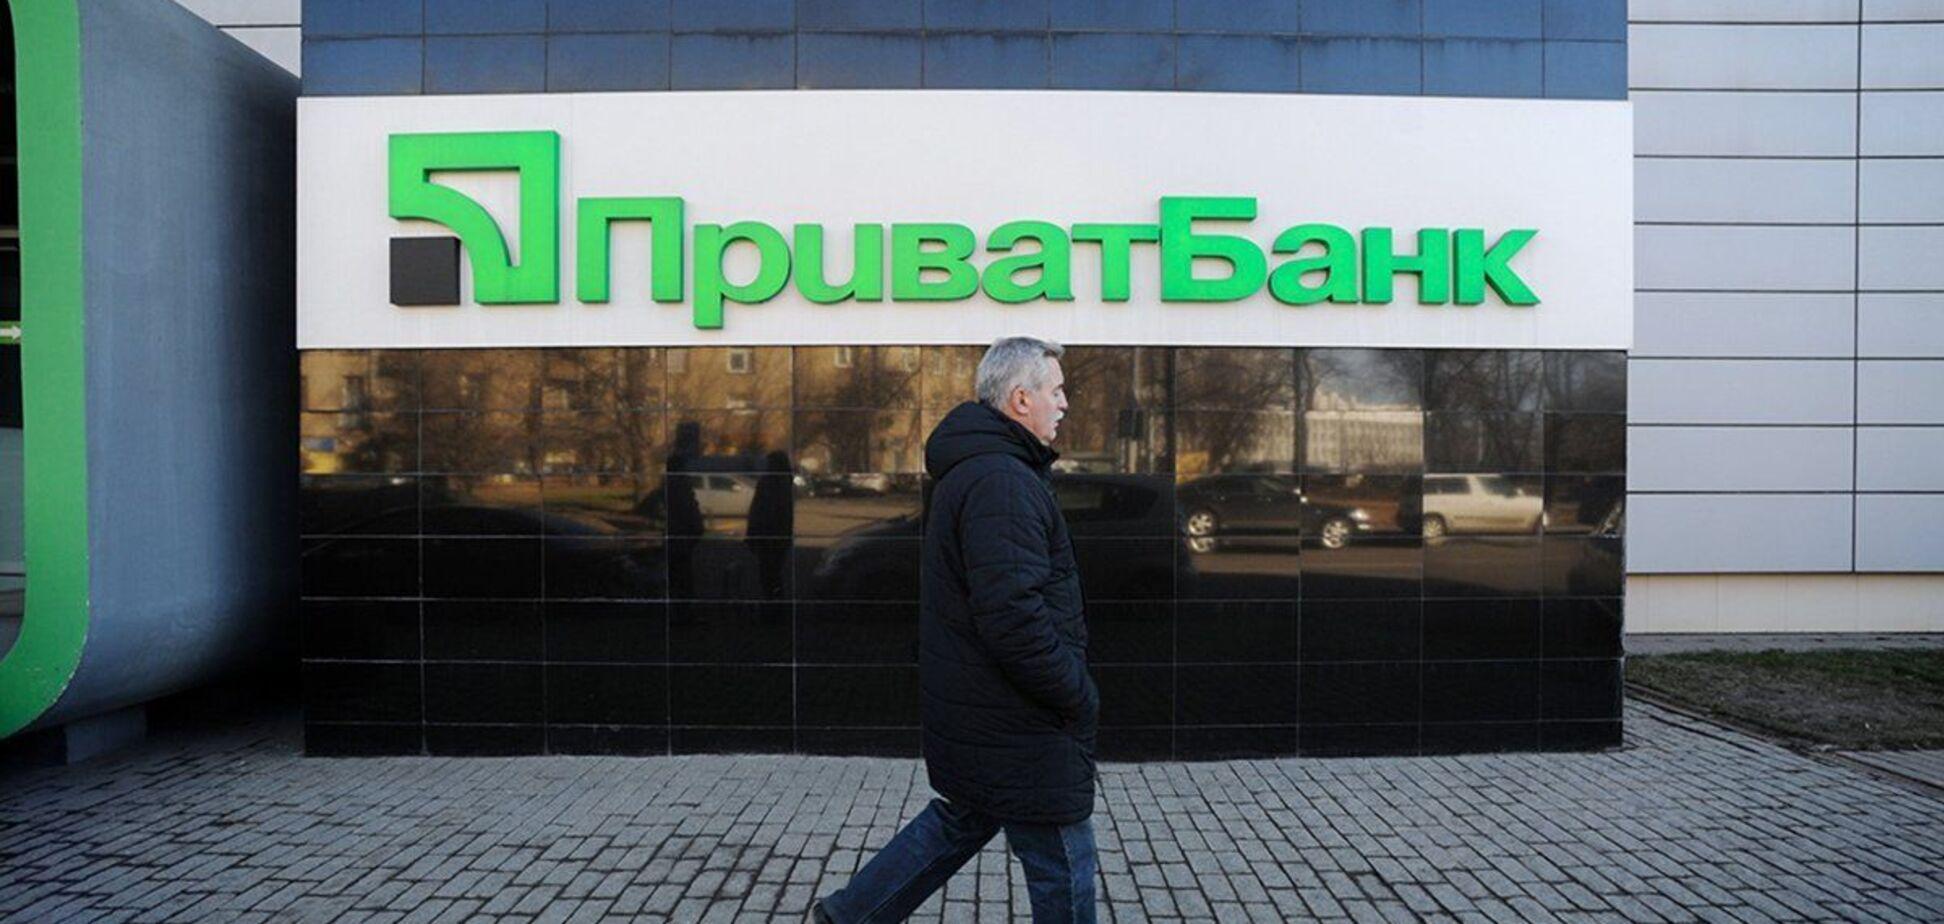 Докази порушень у ПриватБанку зайняли 22 коробки, – Рожкова